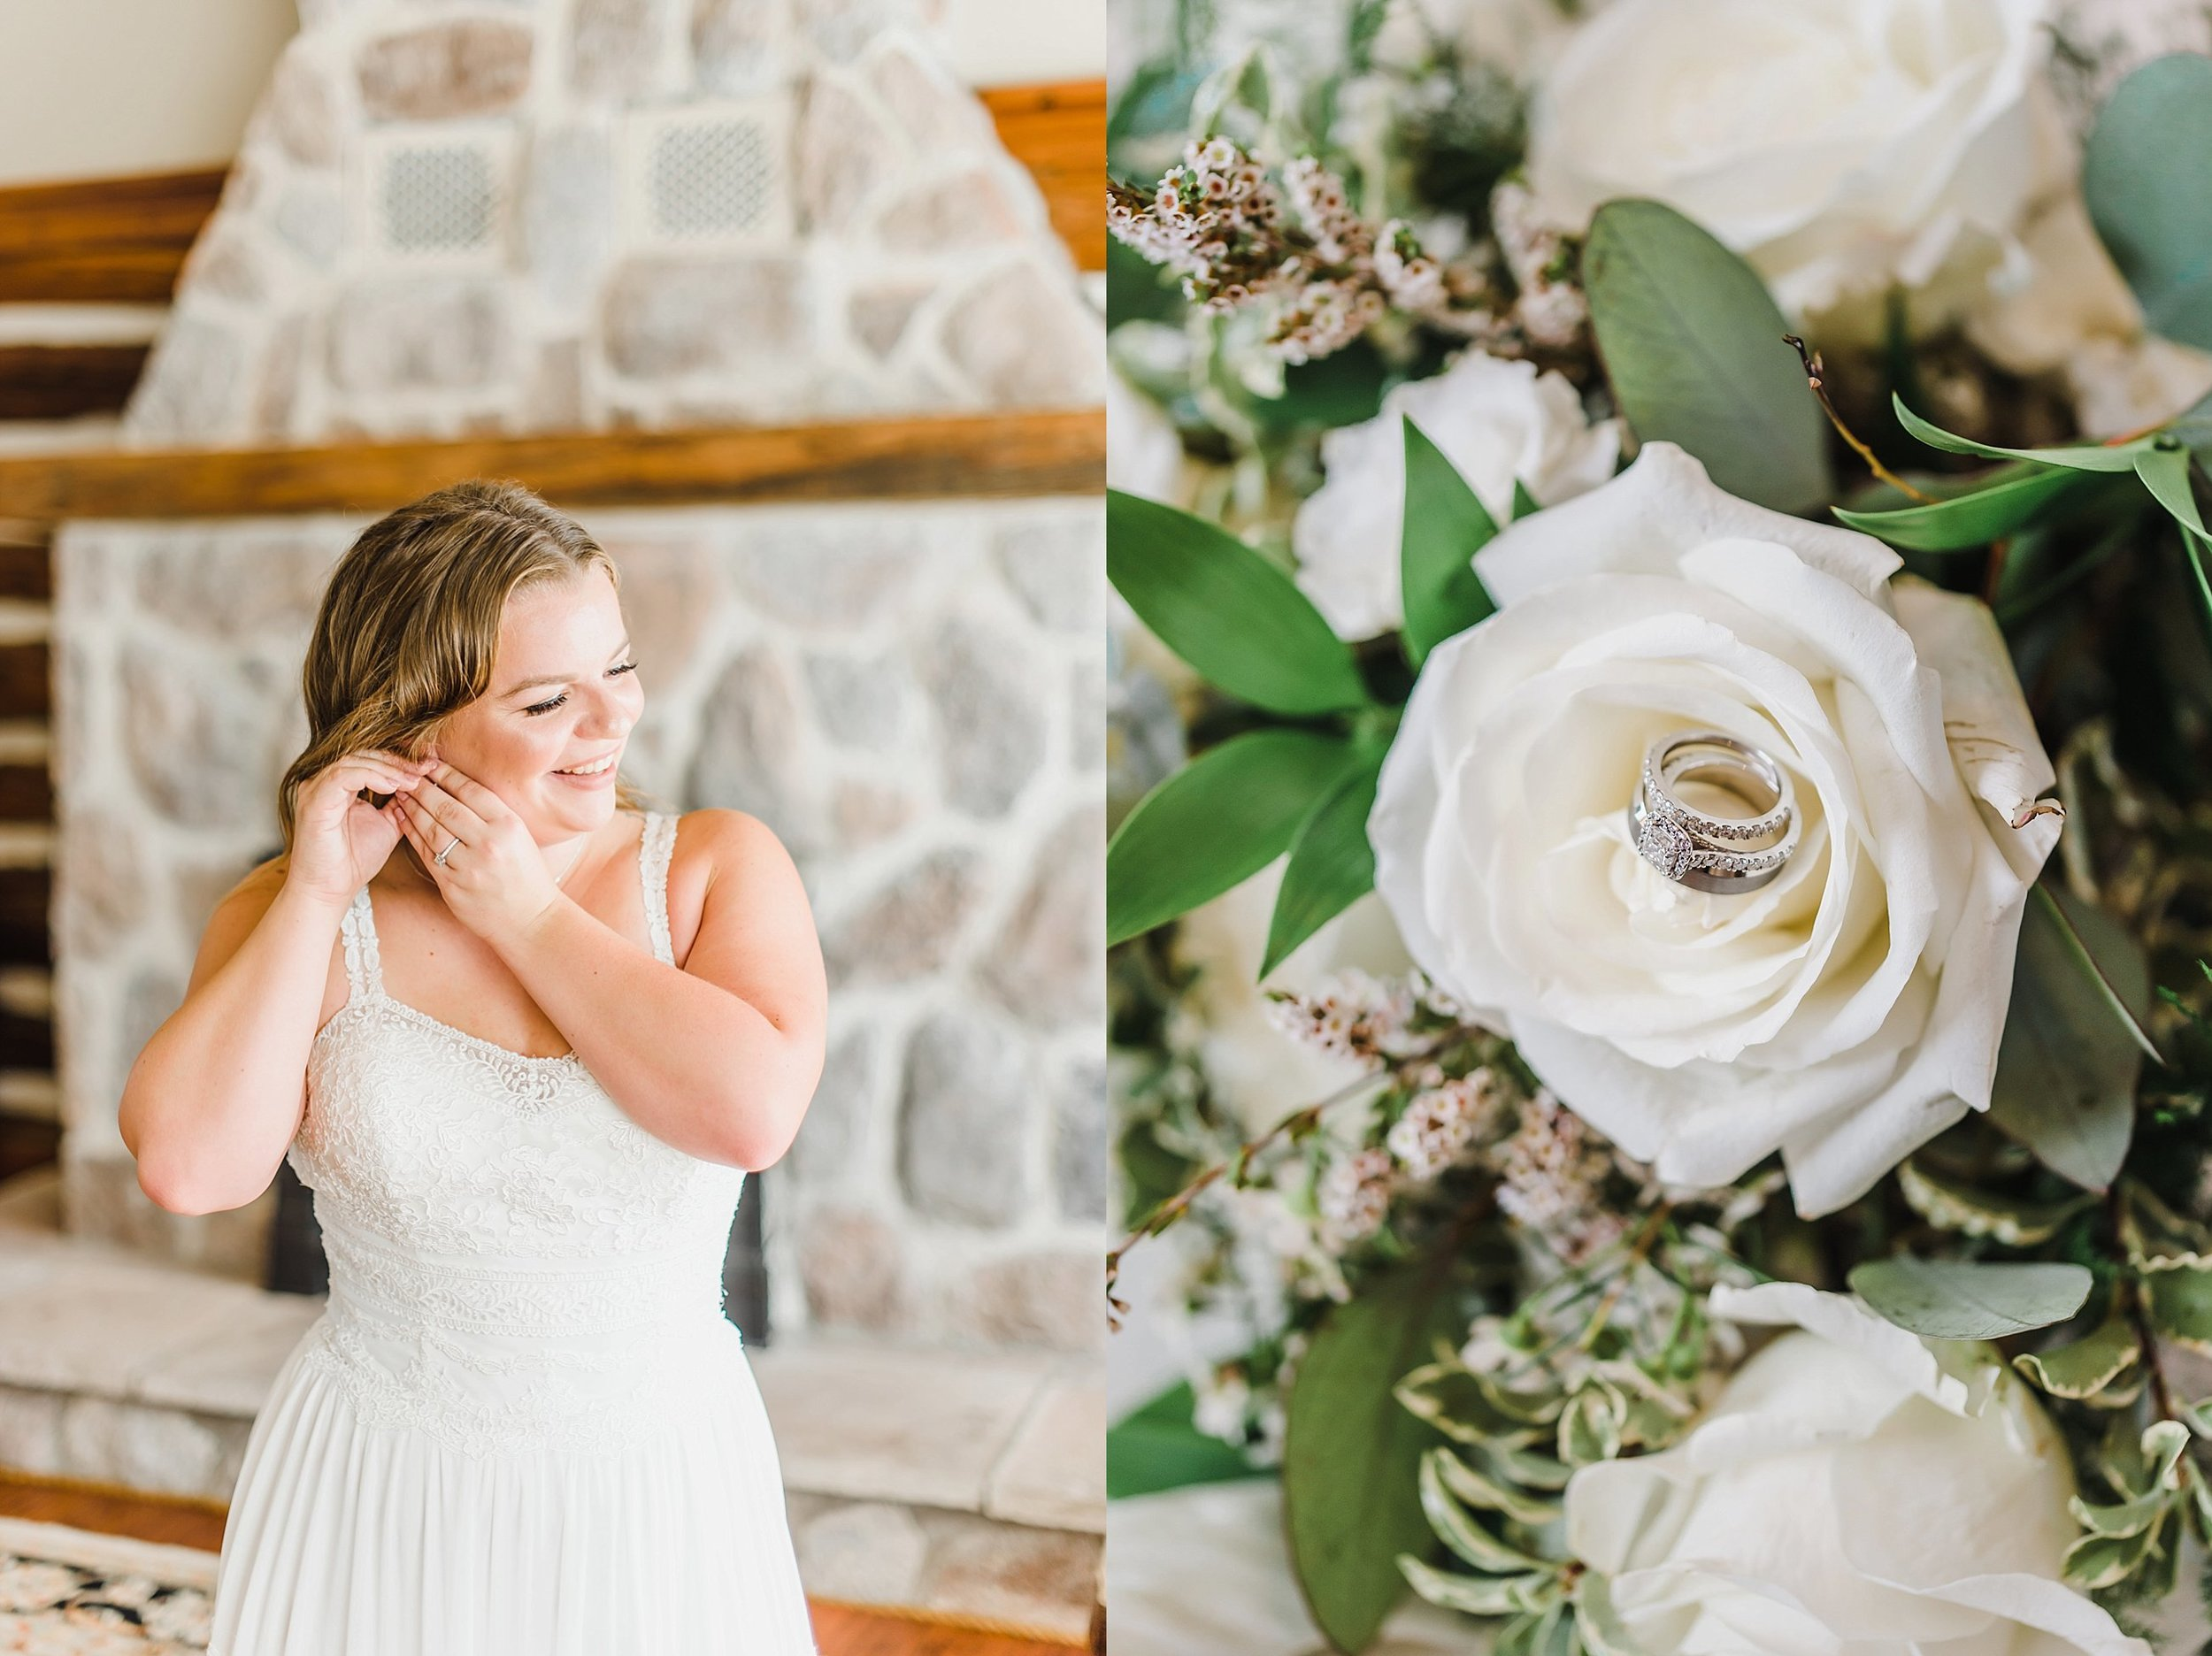 light airy indie fine art ottawa wedding photographer | Ali and Batoul Photography_1070.jpg